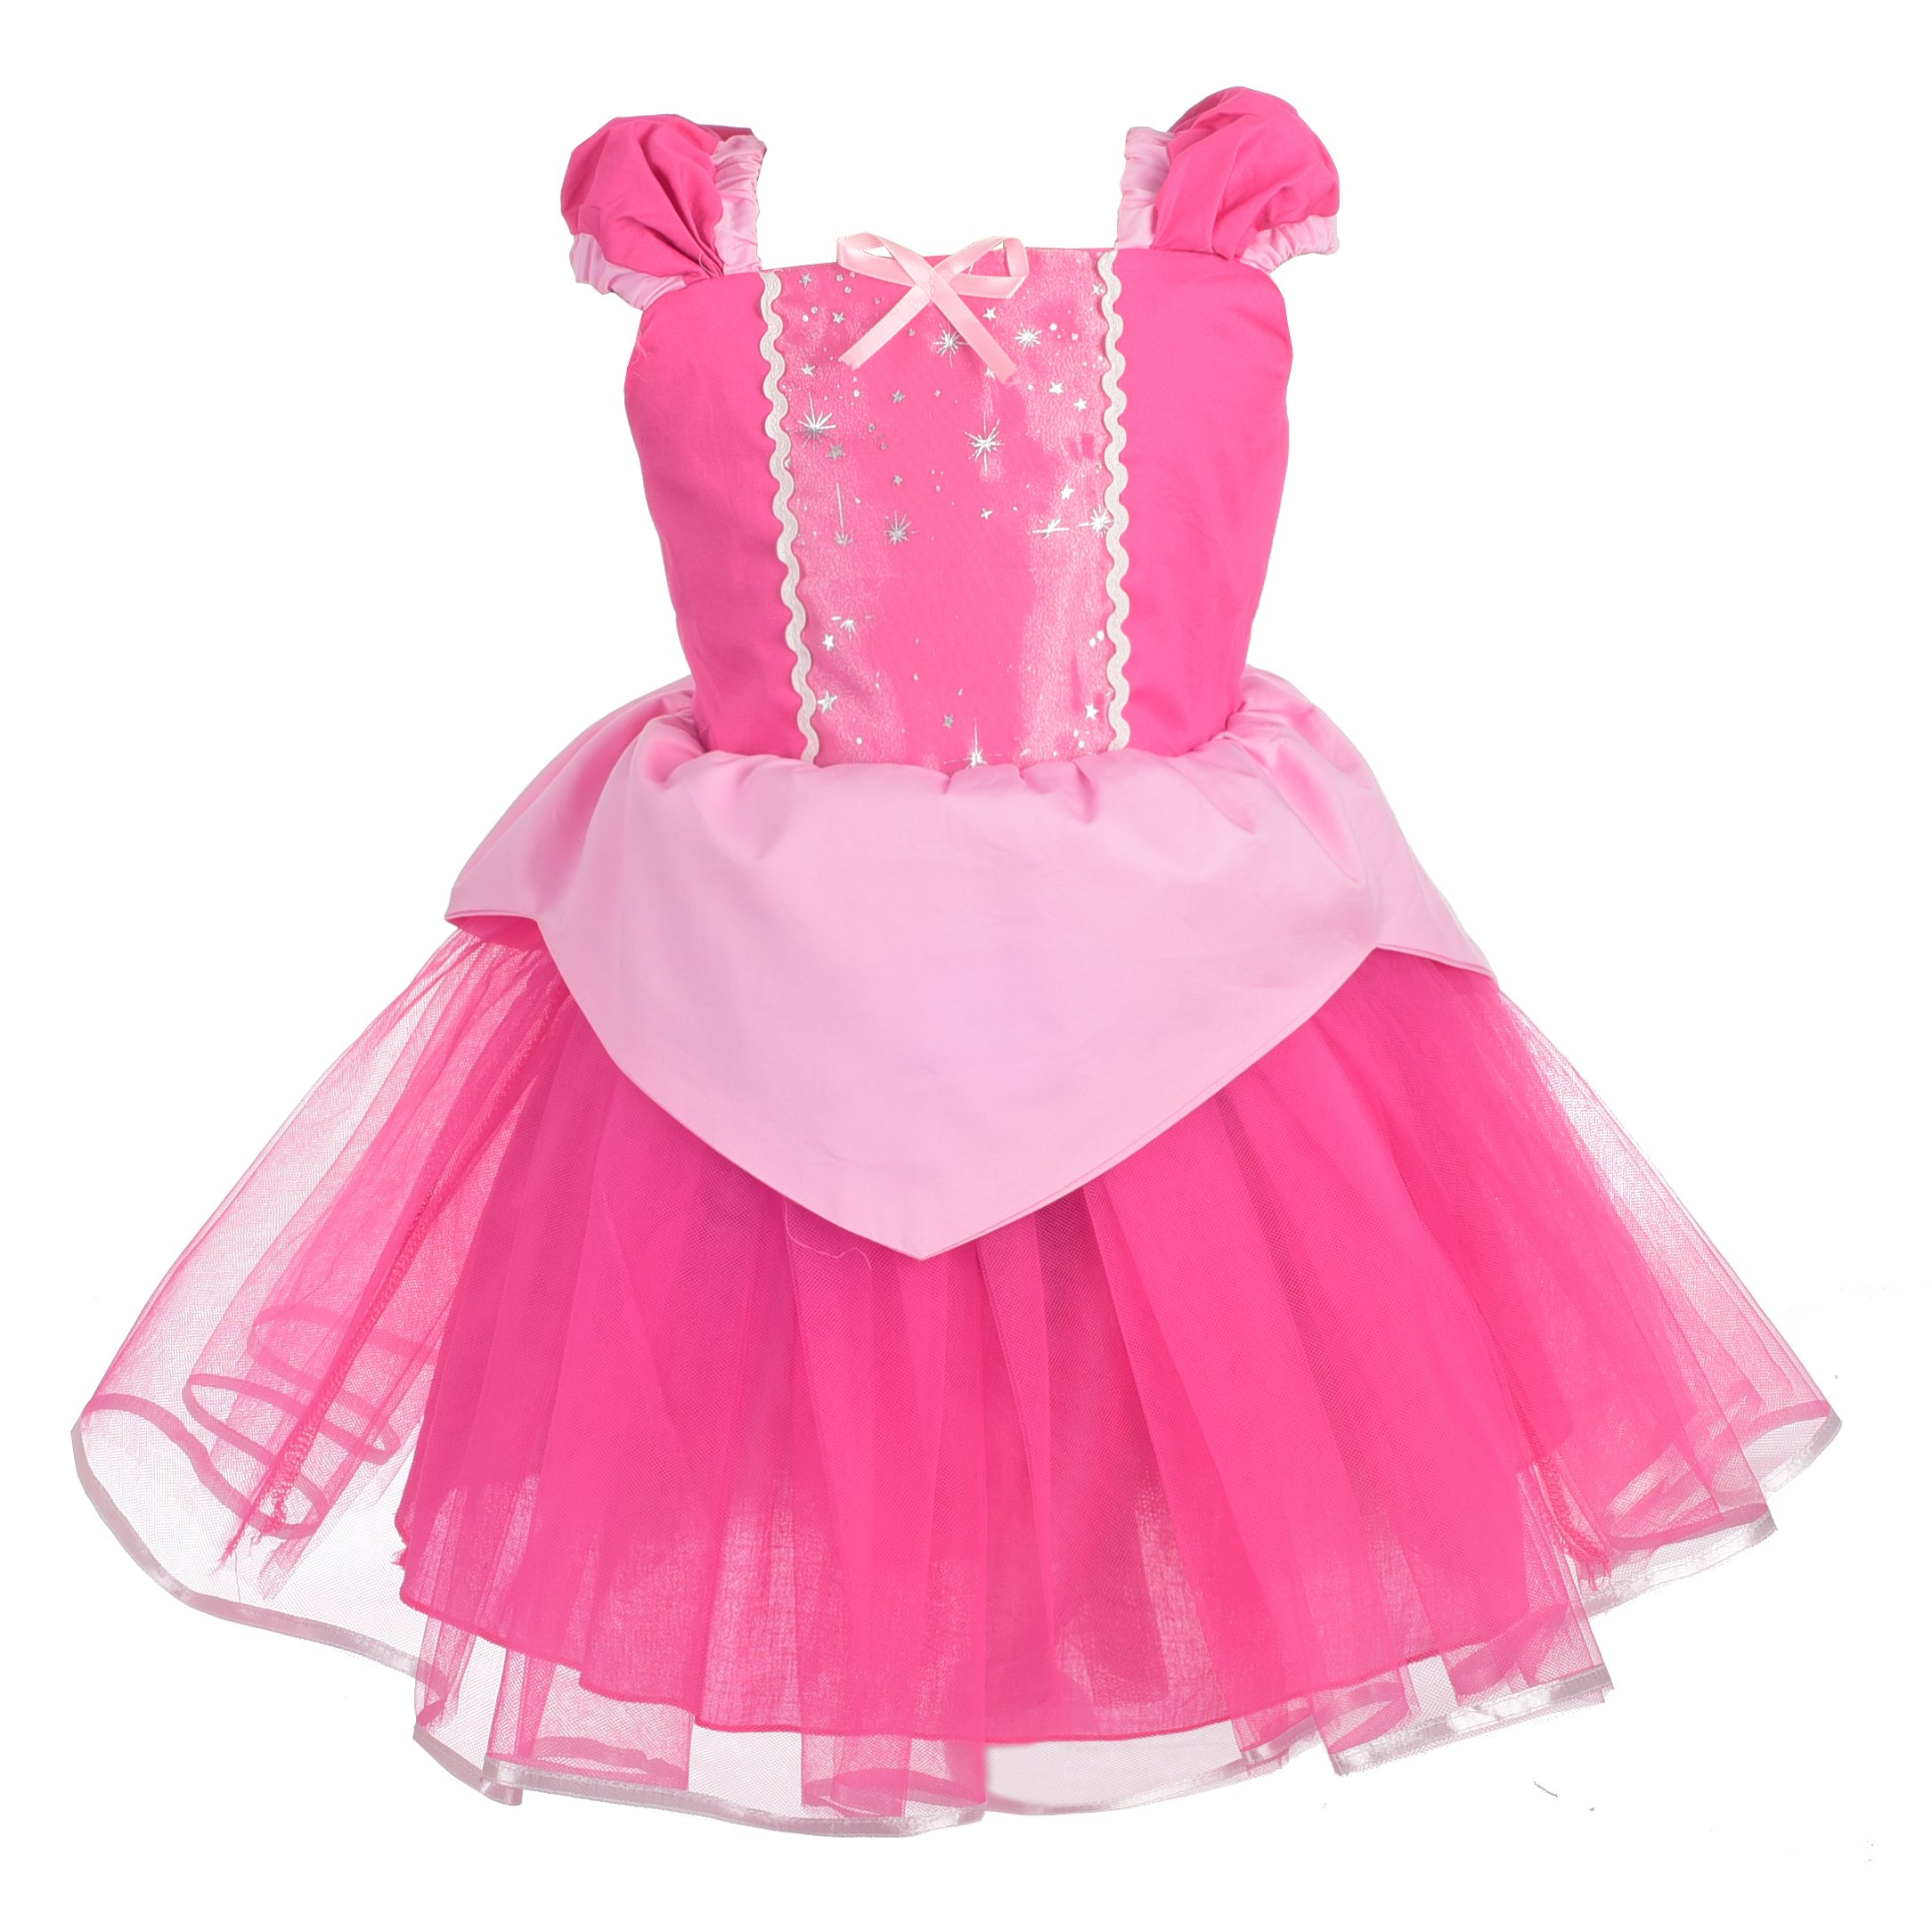 Dressy Daisy Girls Princess Aurora Dress Costume Summer Dress up Size 2T / 3T